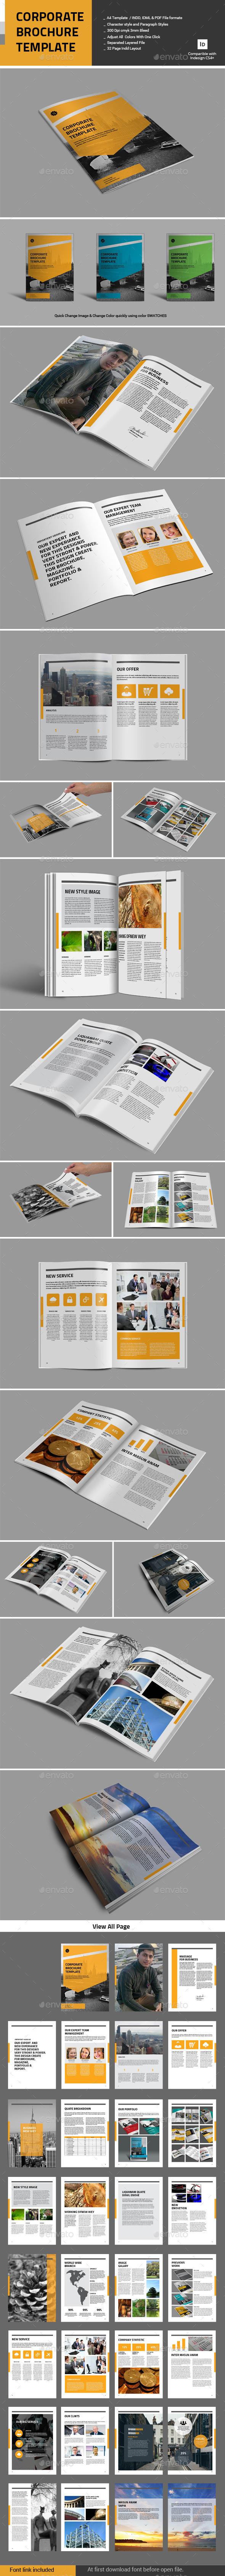 GraphicRiver Corporate Brochure Templage 11383982